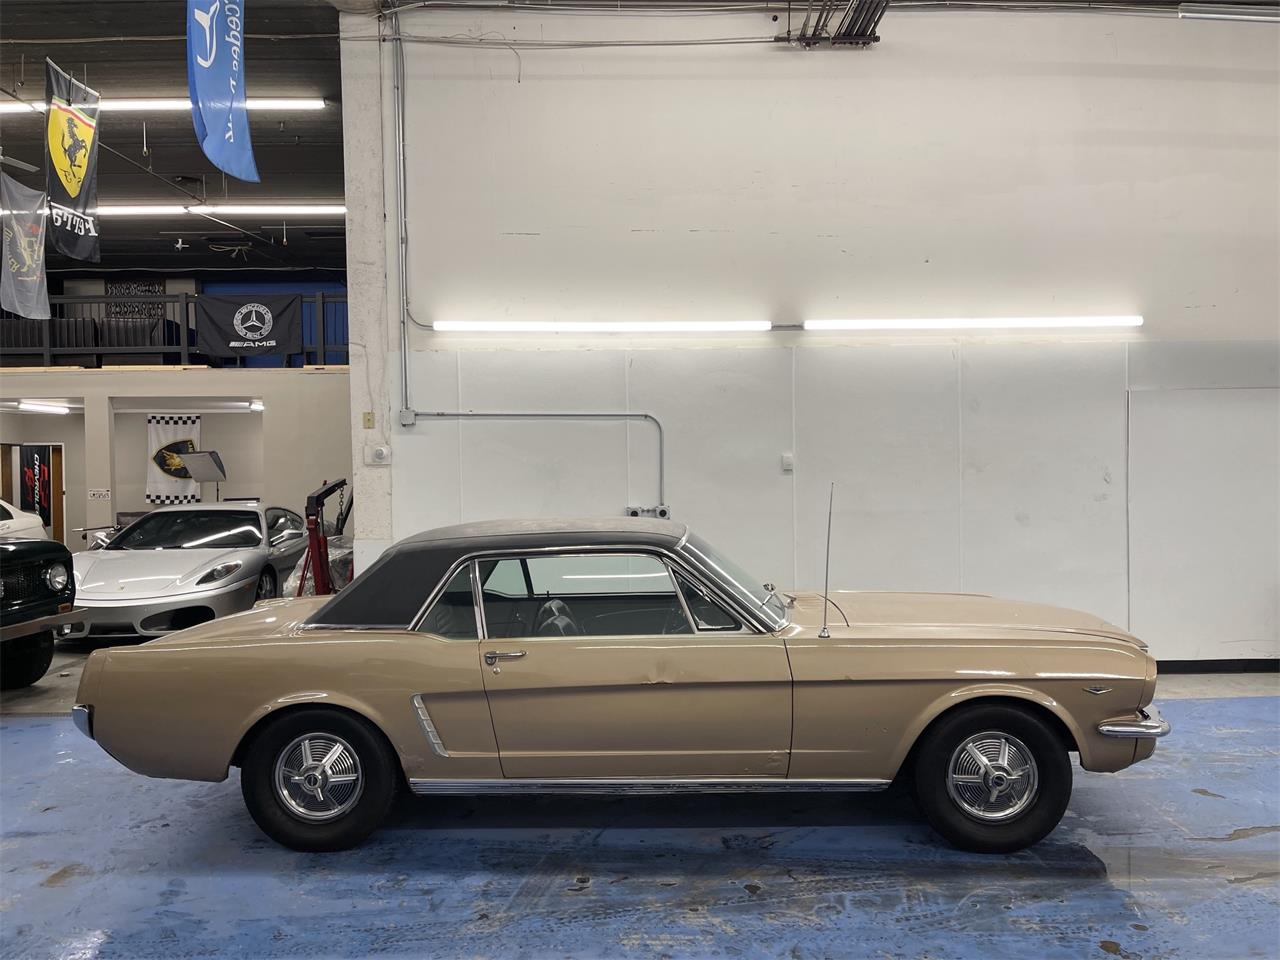 Ford Mustang V8 289 1964 prix tout compris 1964